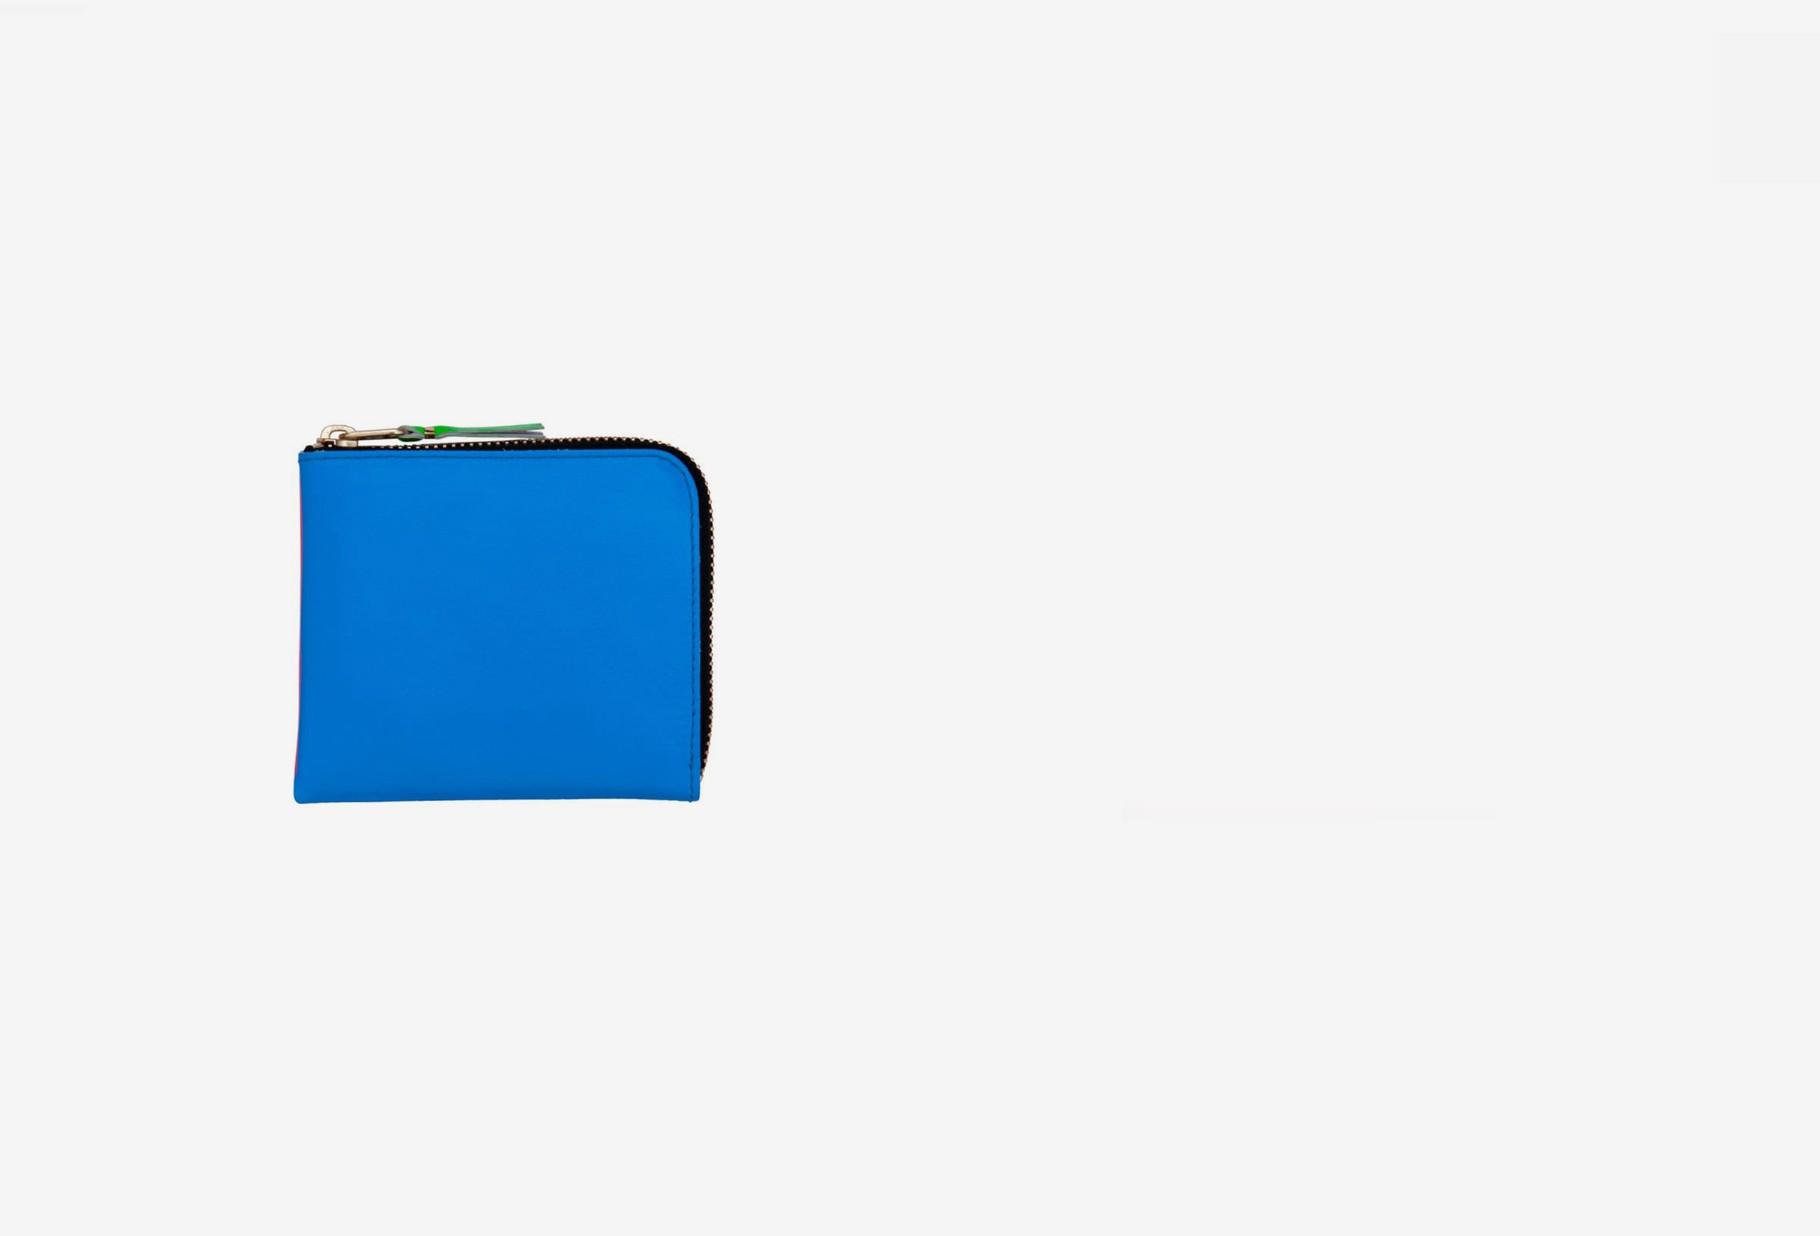 COMME DES GARÇONS WALLETS / Cdg super fluo sa3100sf Orange blue